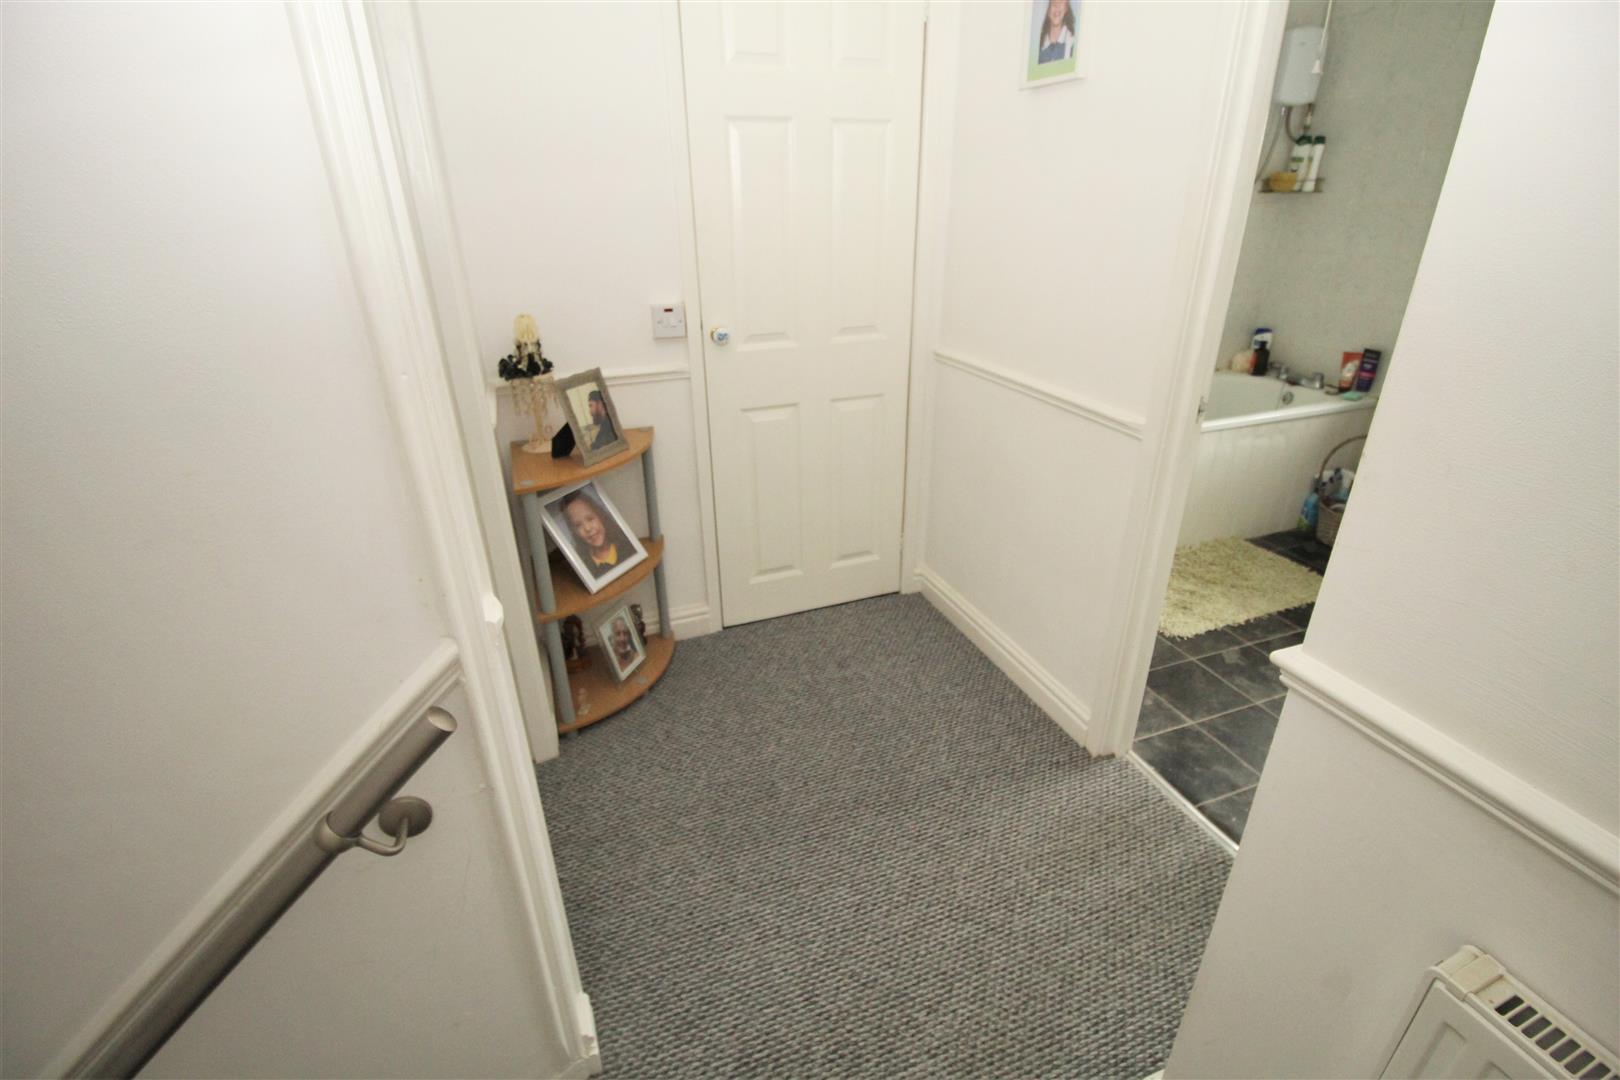 3 Bedrooms, House - End Terrace, Sarahs Croft, Bootle